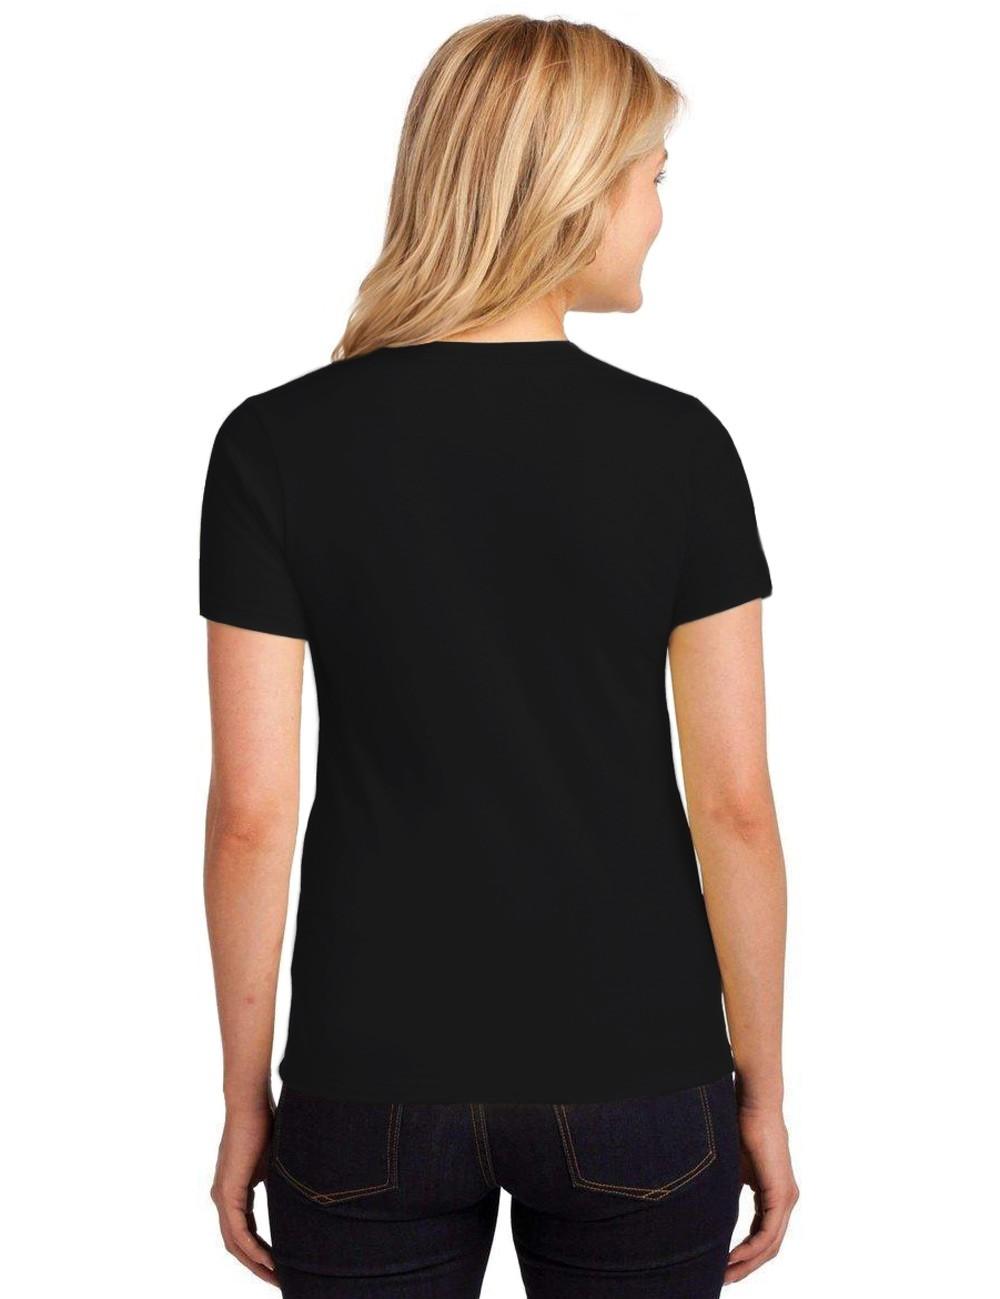 Camiseta Feminina T-Shirt Universitária Faculdade Biologia